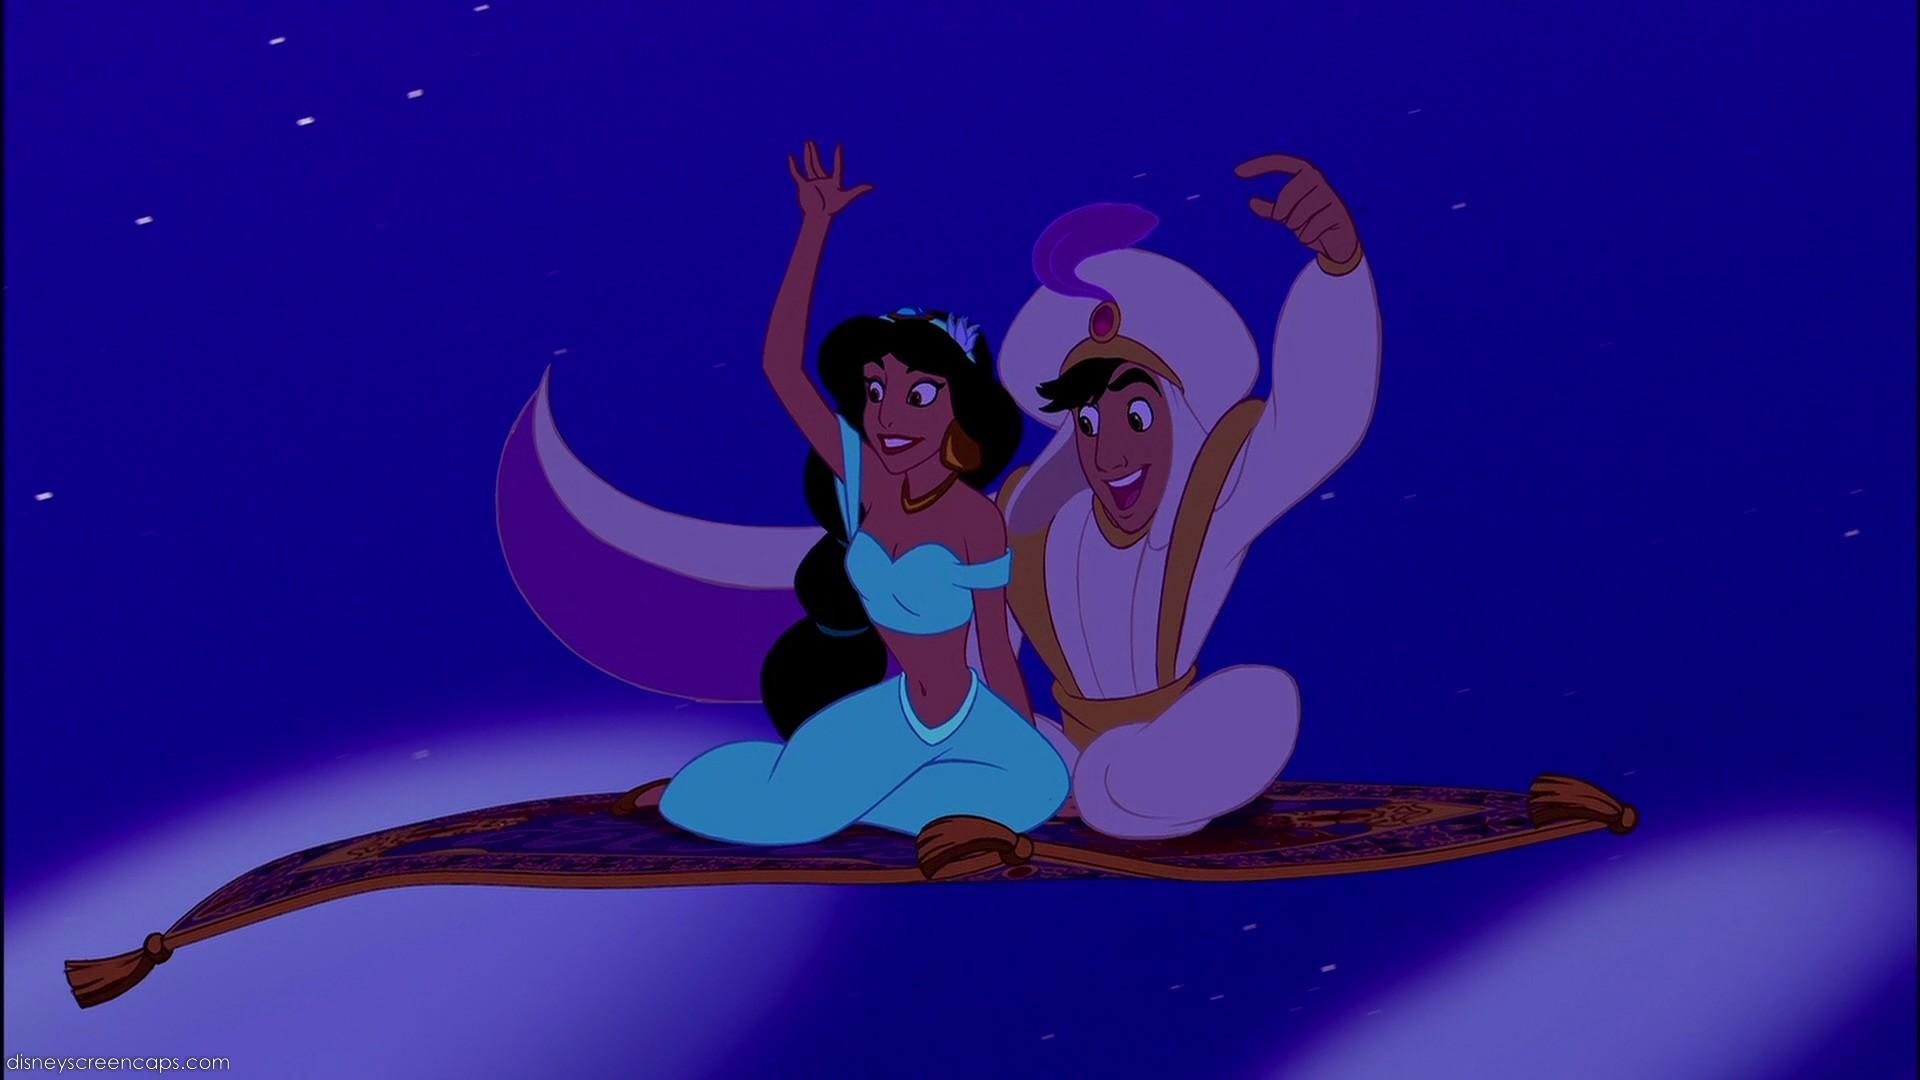 Beauty Aladdin Wallpaper for Aladdin Wallpaper Tumblr  157uhy